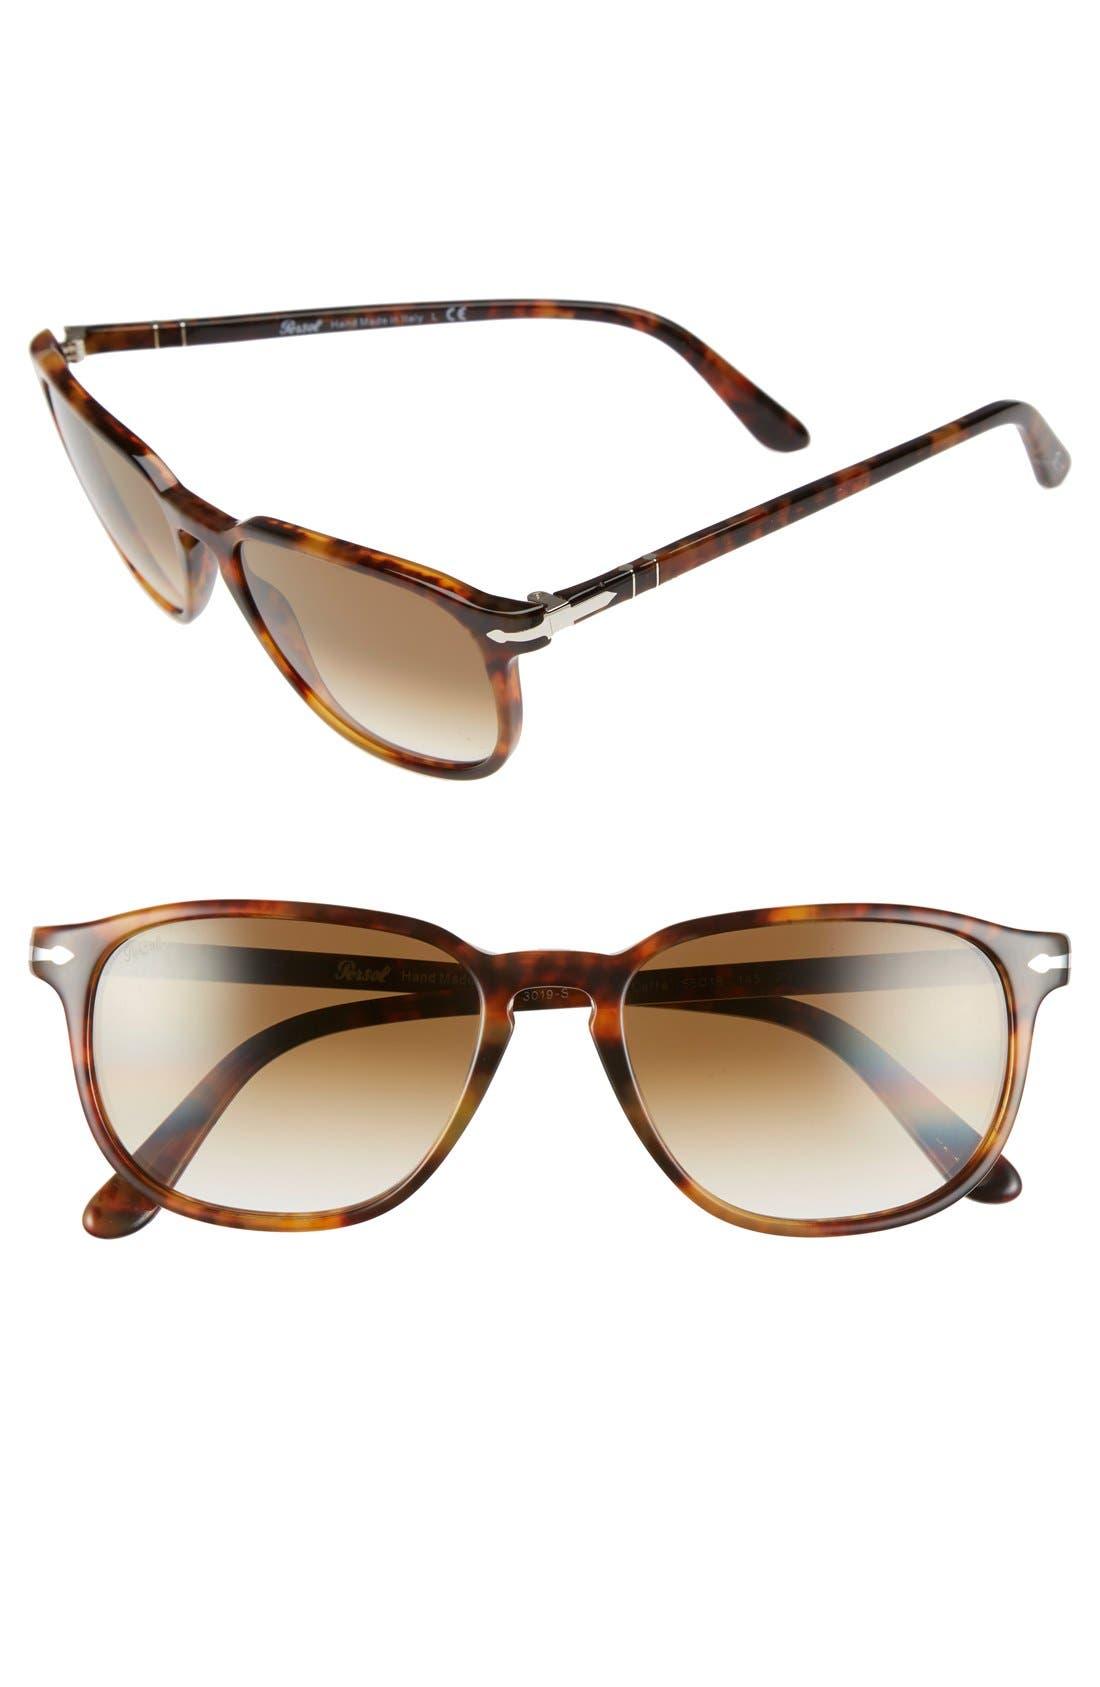 PERSOL 53Mm Square Keyhole Sunglasses - Dark Tortoise